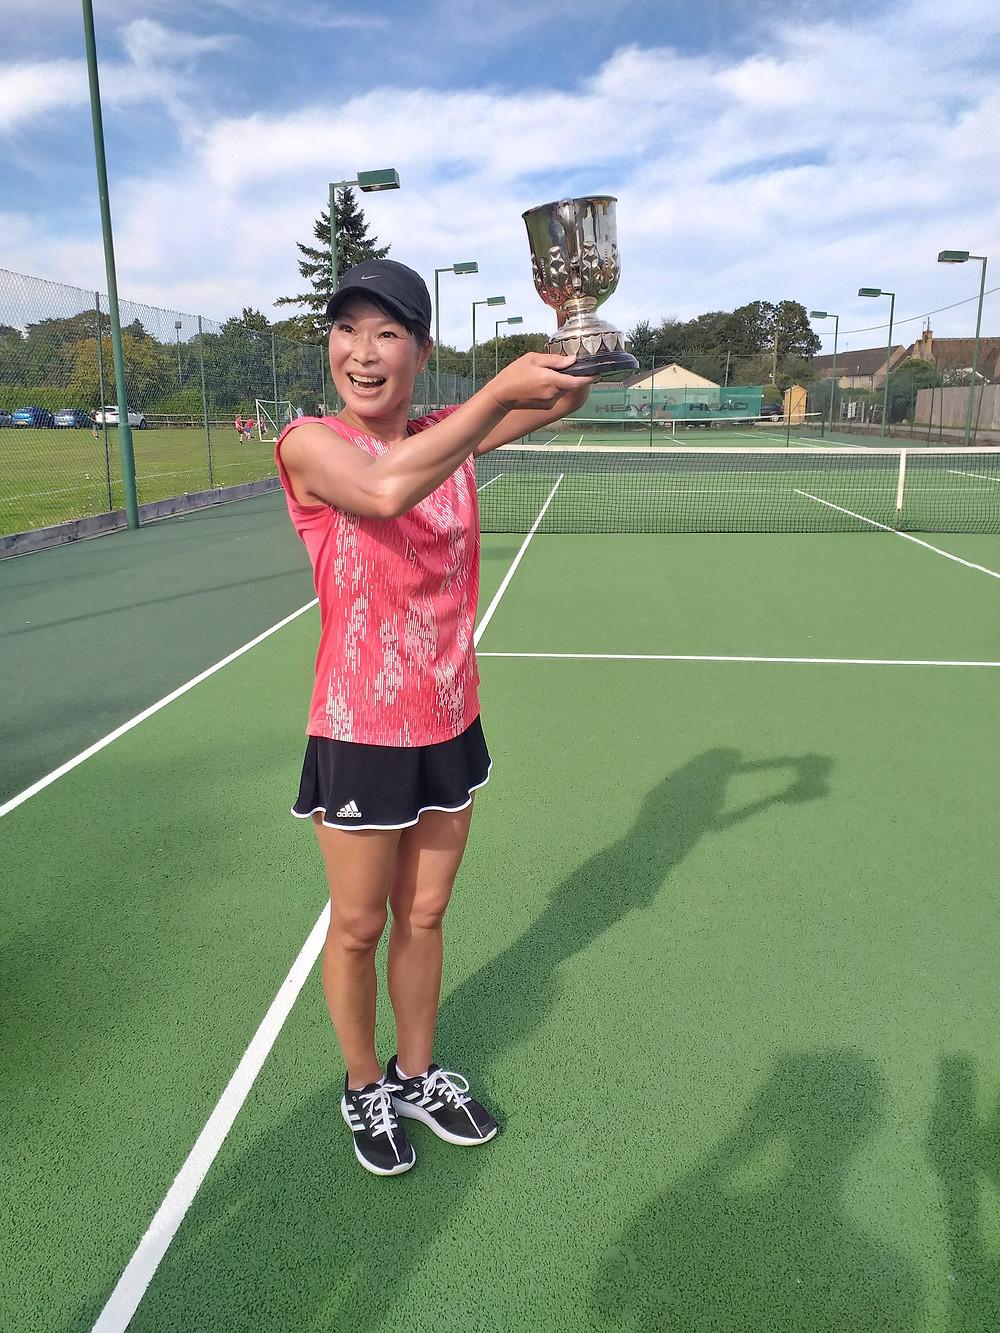 Bourton Vale LTC's 2019 Ladies' Singles Champion Yoko Peyton